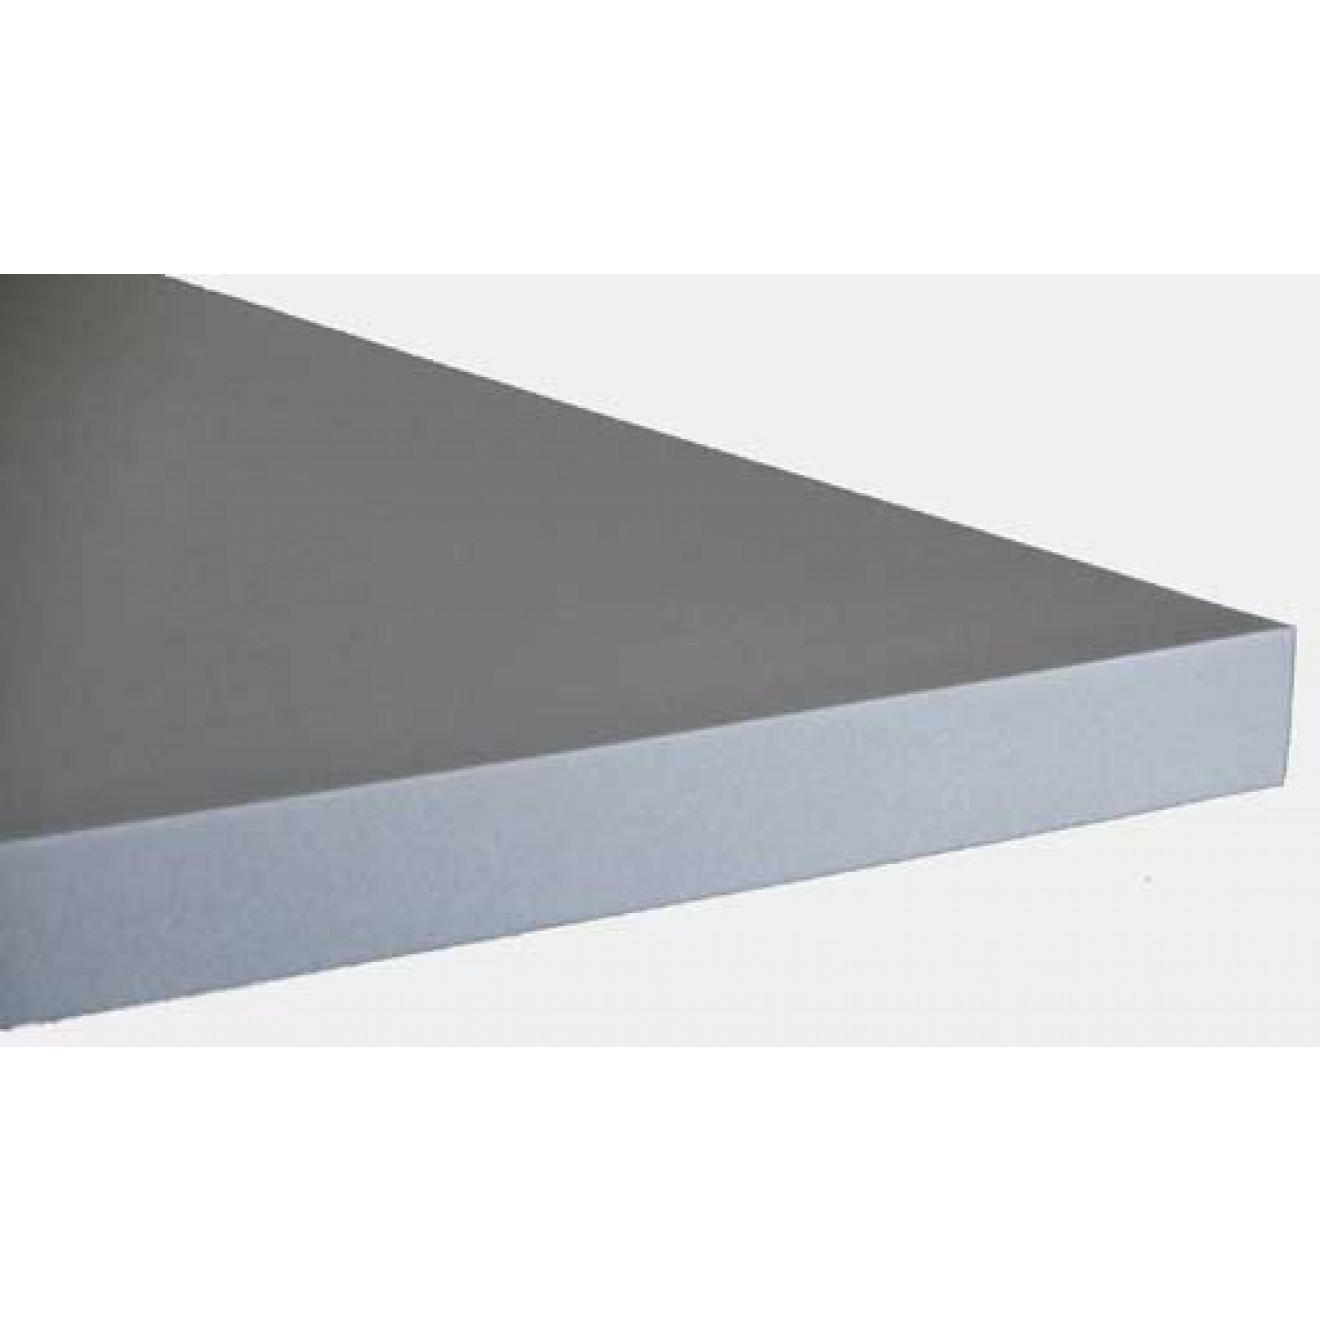 handmuster baso plan absorber grau schaumstoff direkt vom. Black Bedroom Furniture Sets. Home Design Ideas